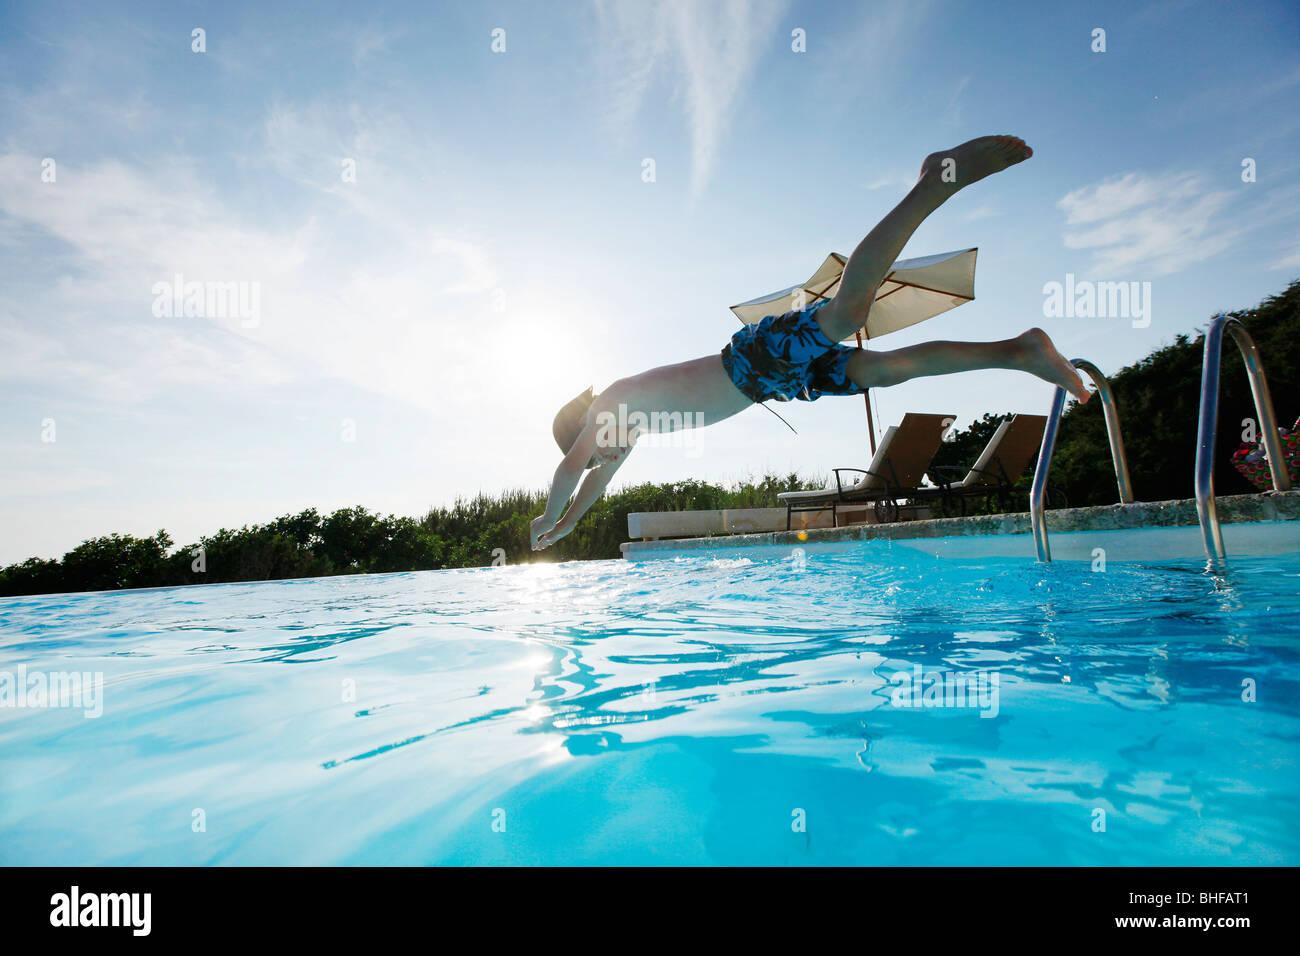 Boy diving into the pool, pool, Las Dunas Playa, Formentera, Balearic Islands, Spain - Stock Image